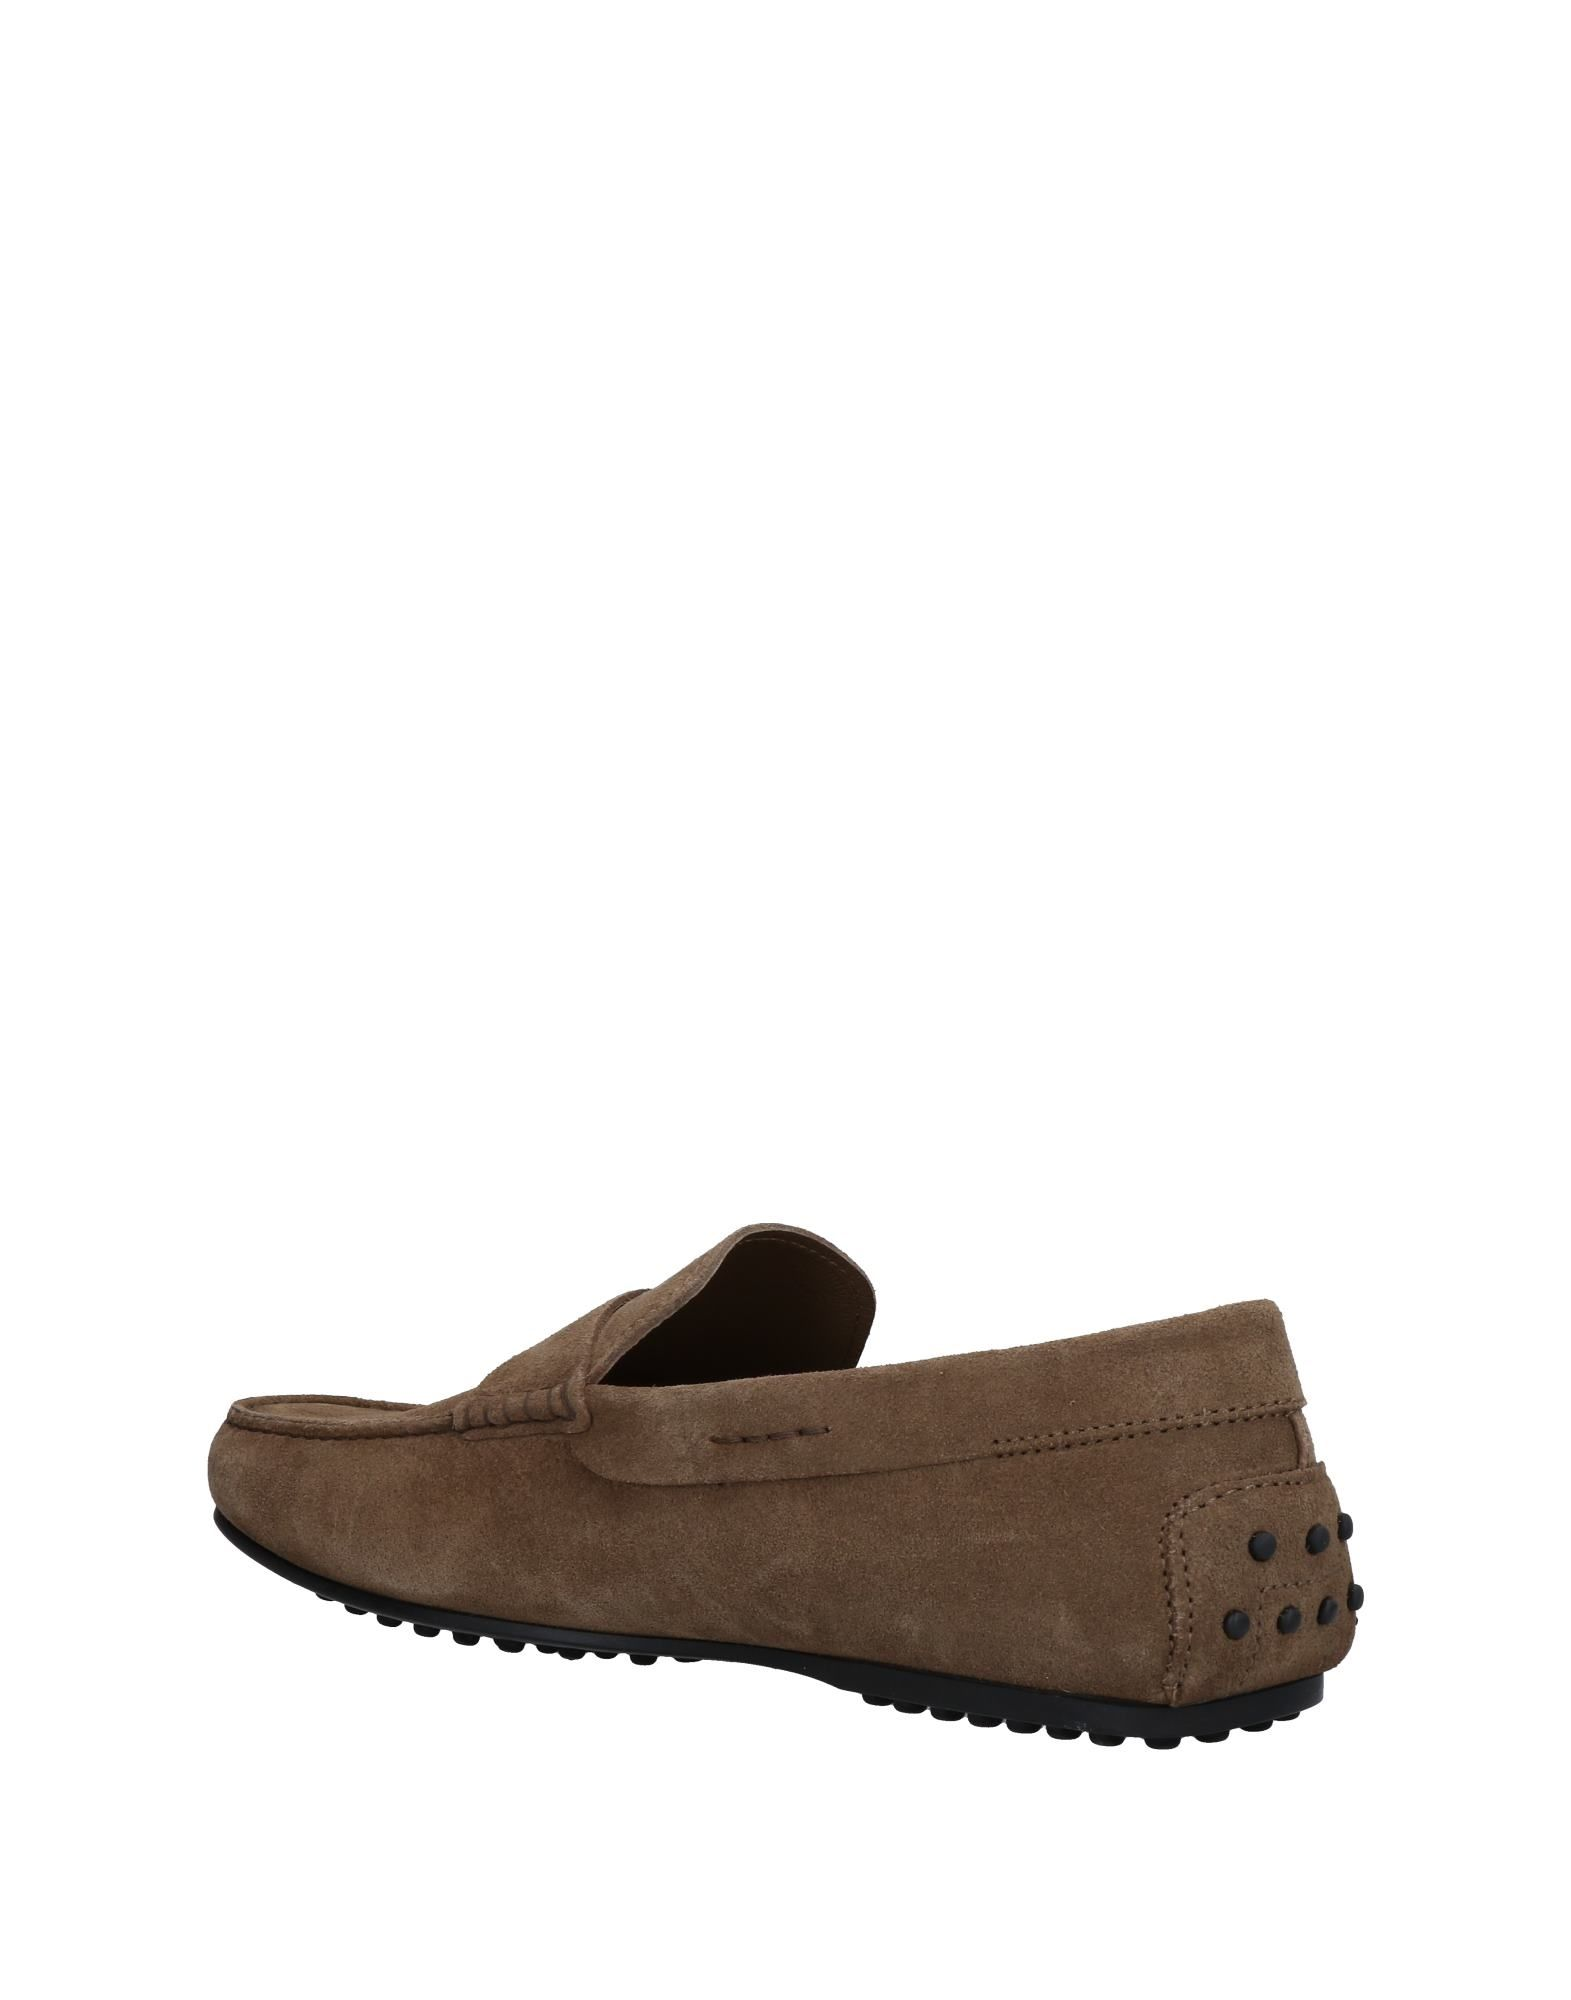 Tod's Gute Mokassins Herren  11036754JN Gute Tod's Qualität beliebte Schuhe c37f29